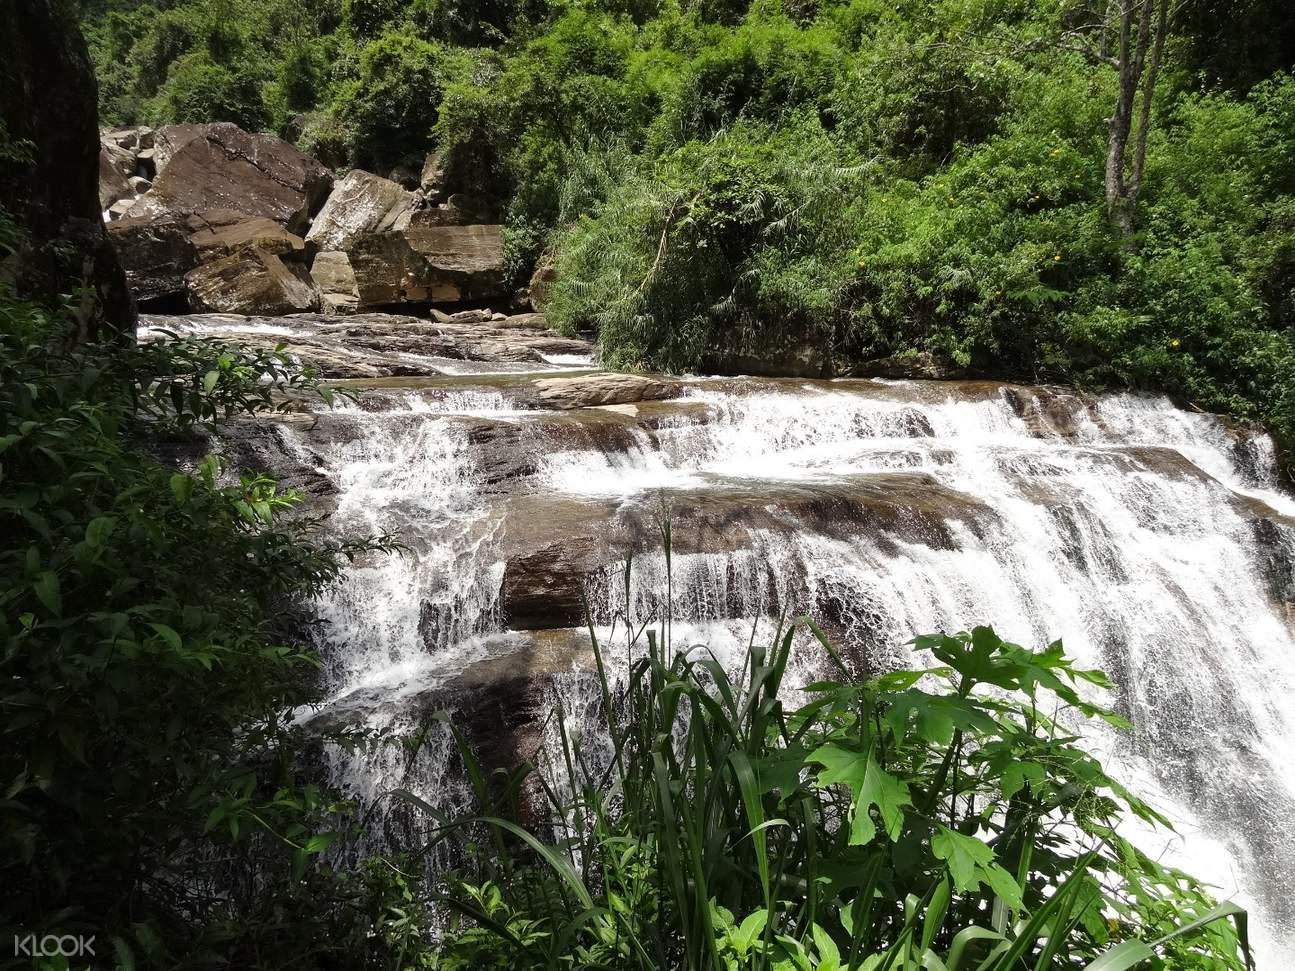 Ramboda water falls